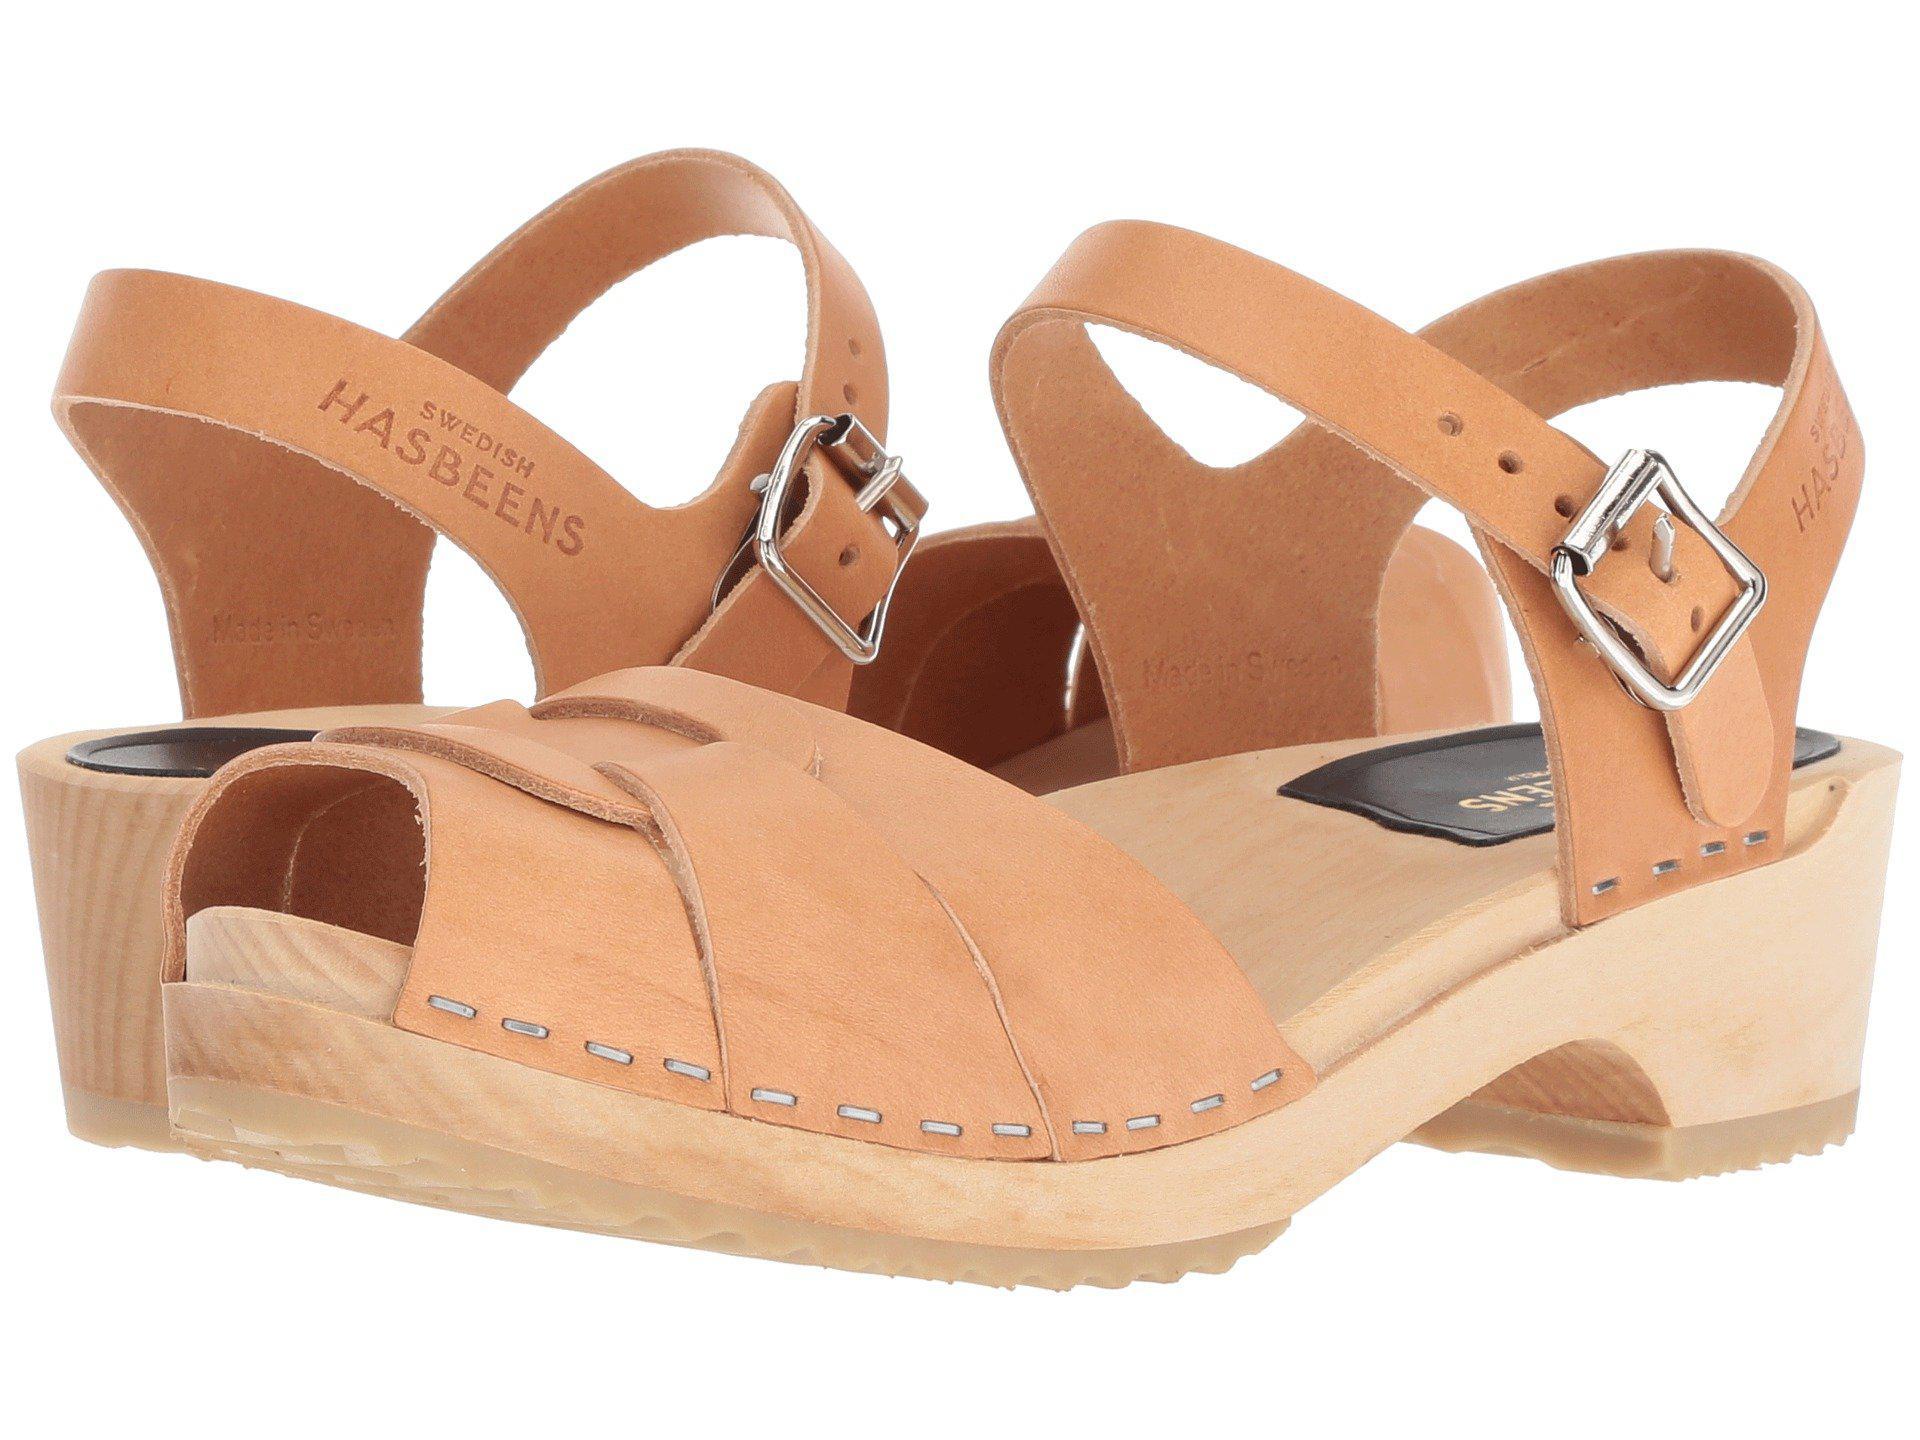 d9318ec145 Swedish Hasbeens - Multicolor Peep Toe Low (nature) Women's Sandals - Lyst.  View fullscreen